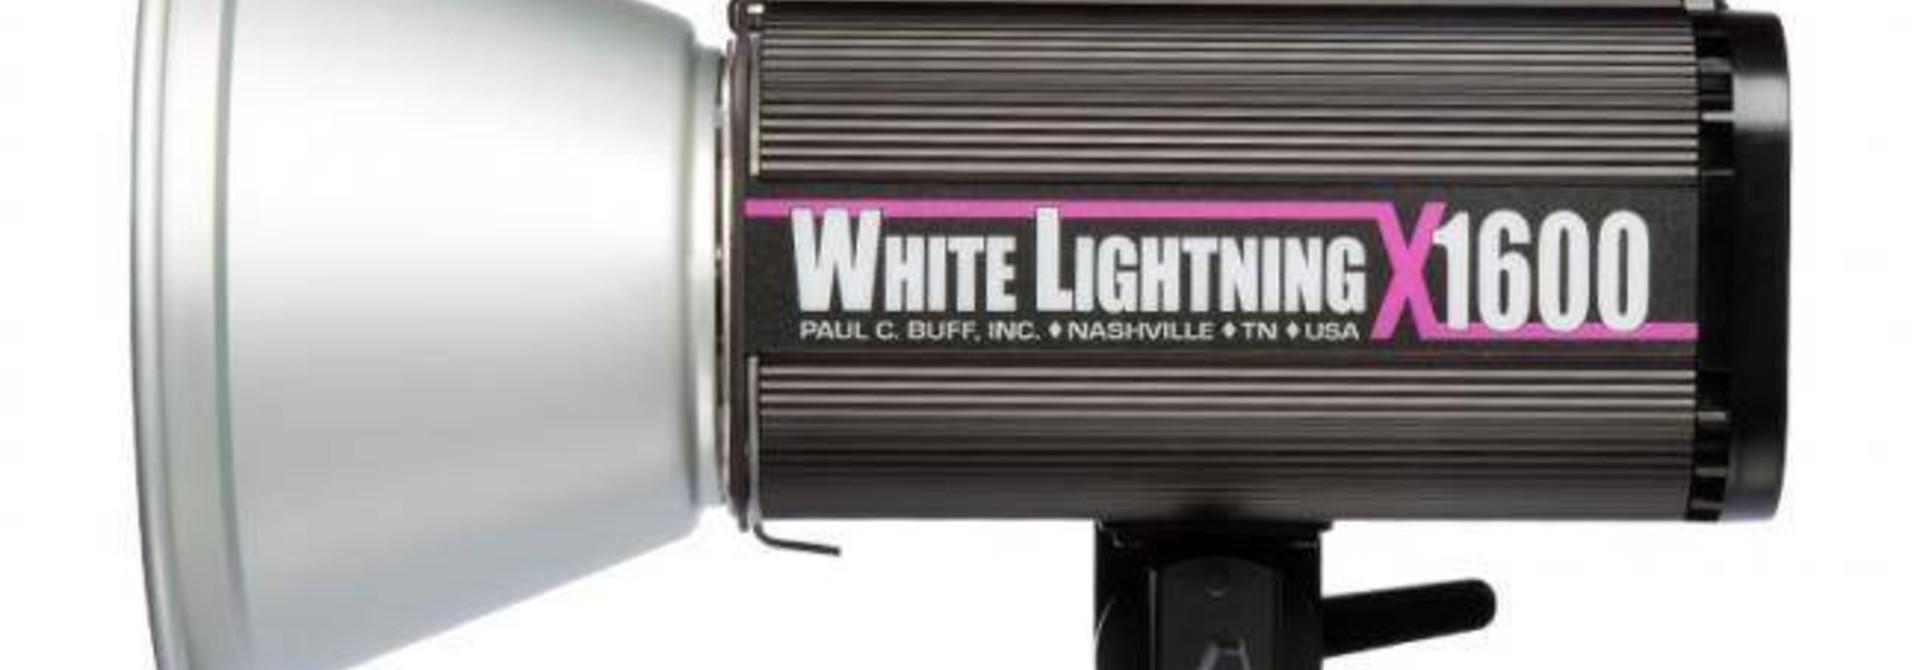 White Lightning Flash Unit X1600